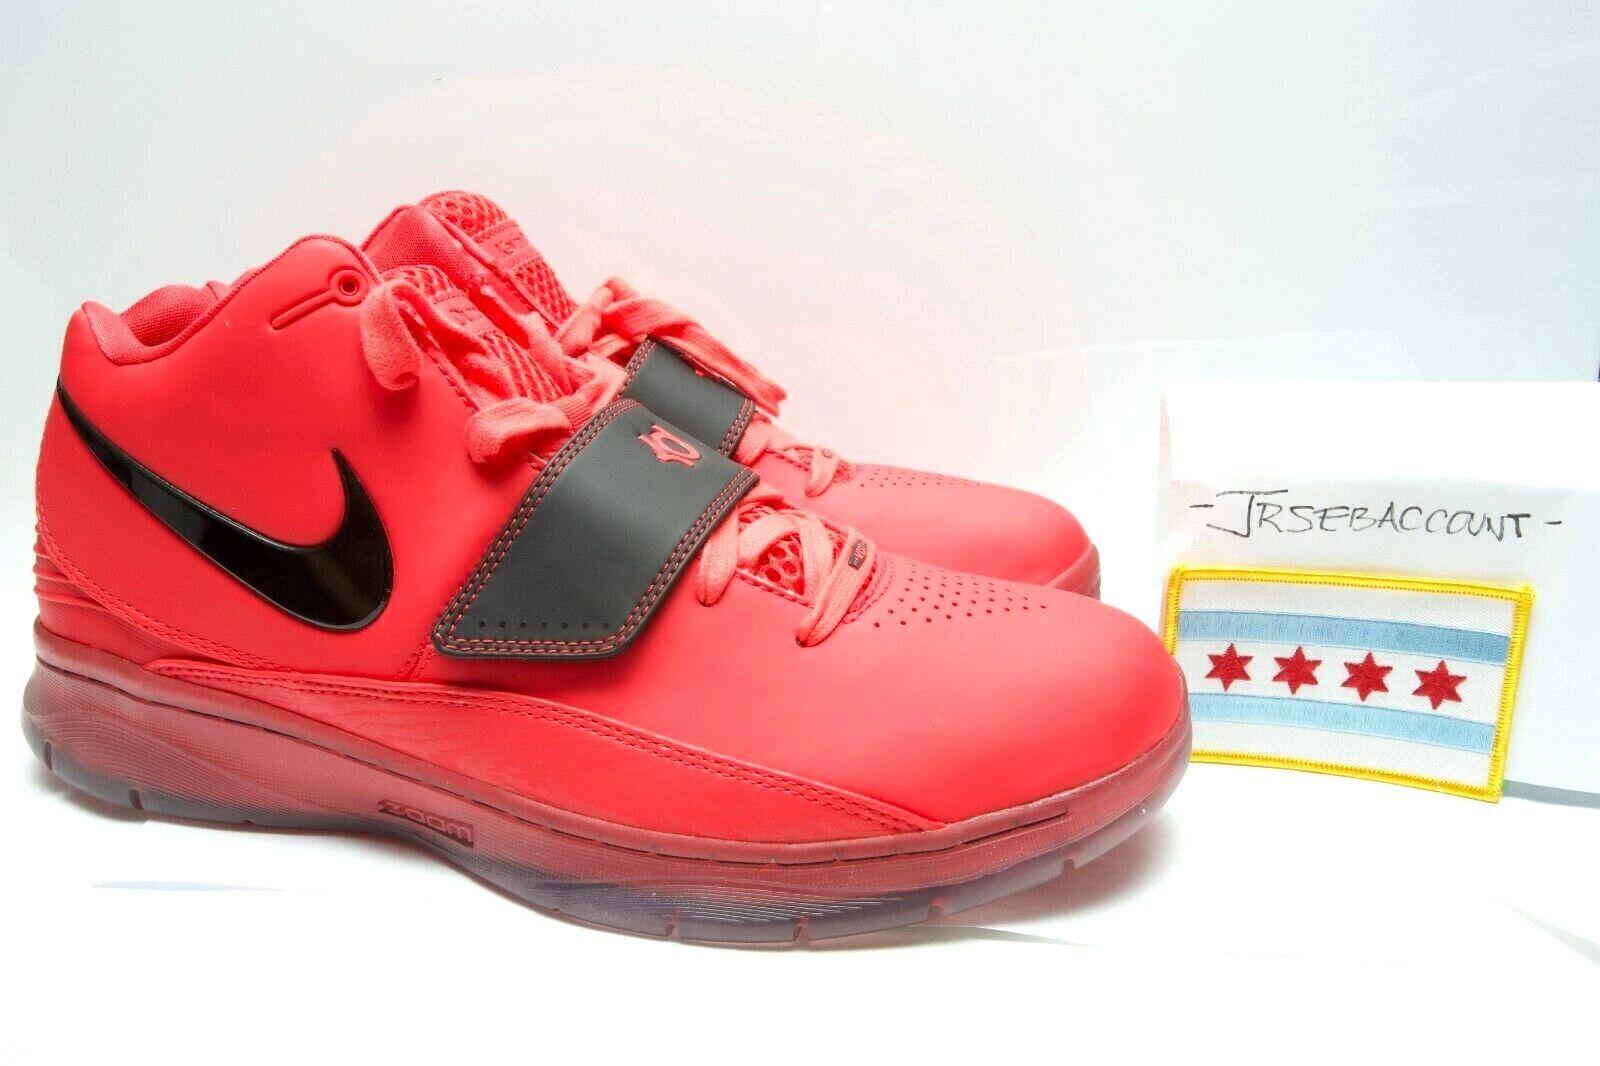 Nike Zoom KD II 2 - All Star - Size 11 - 386423-600